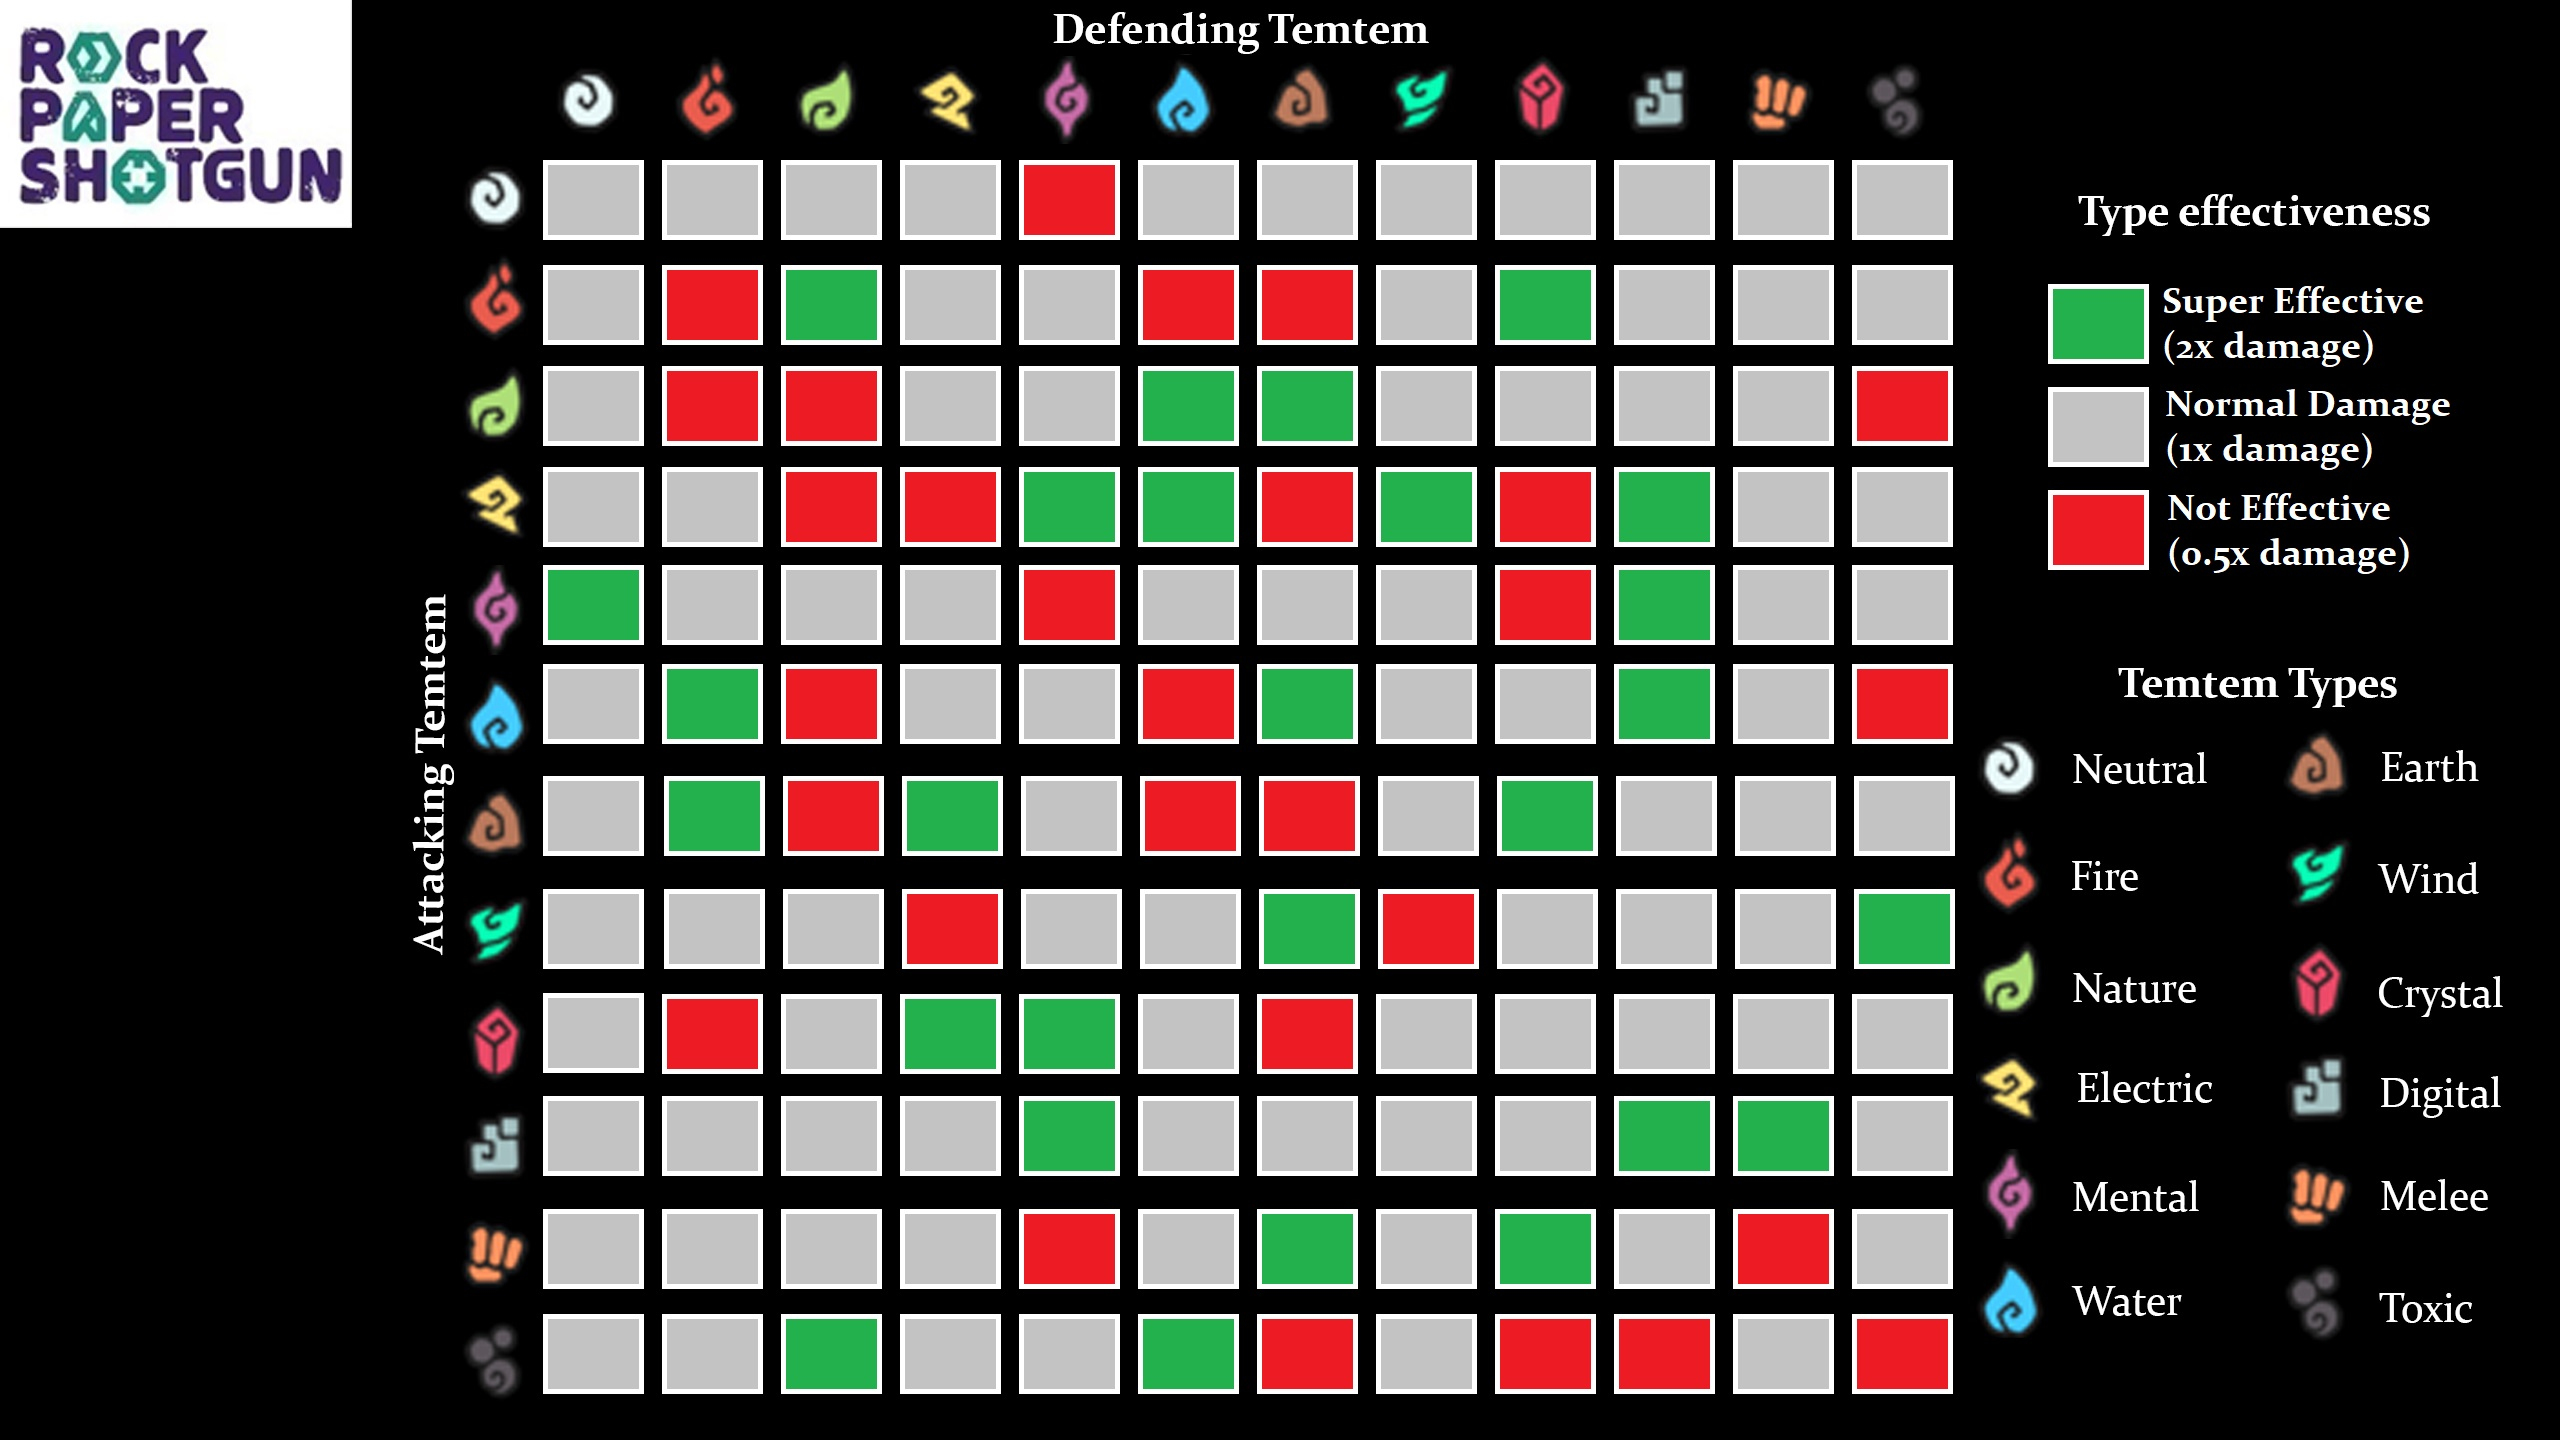 Temtem Types Chart